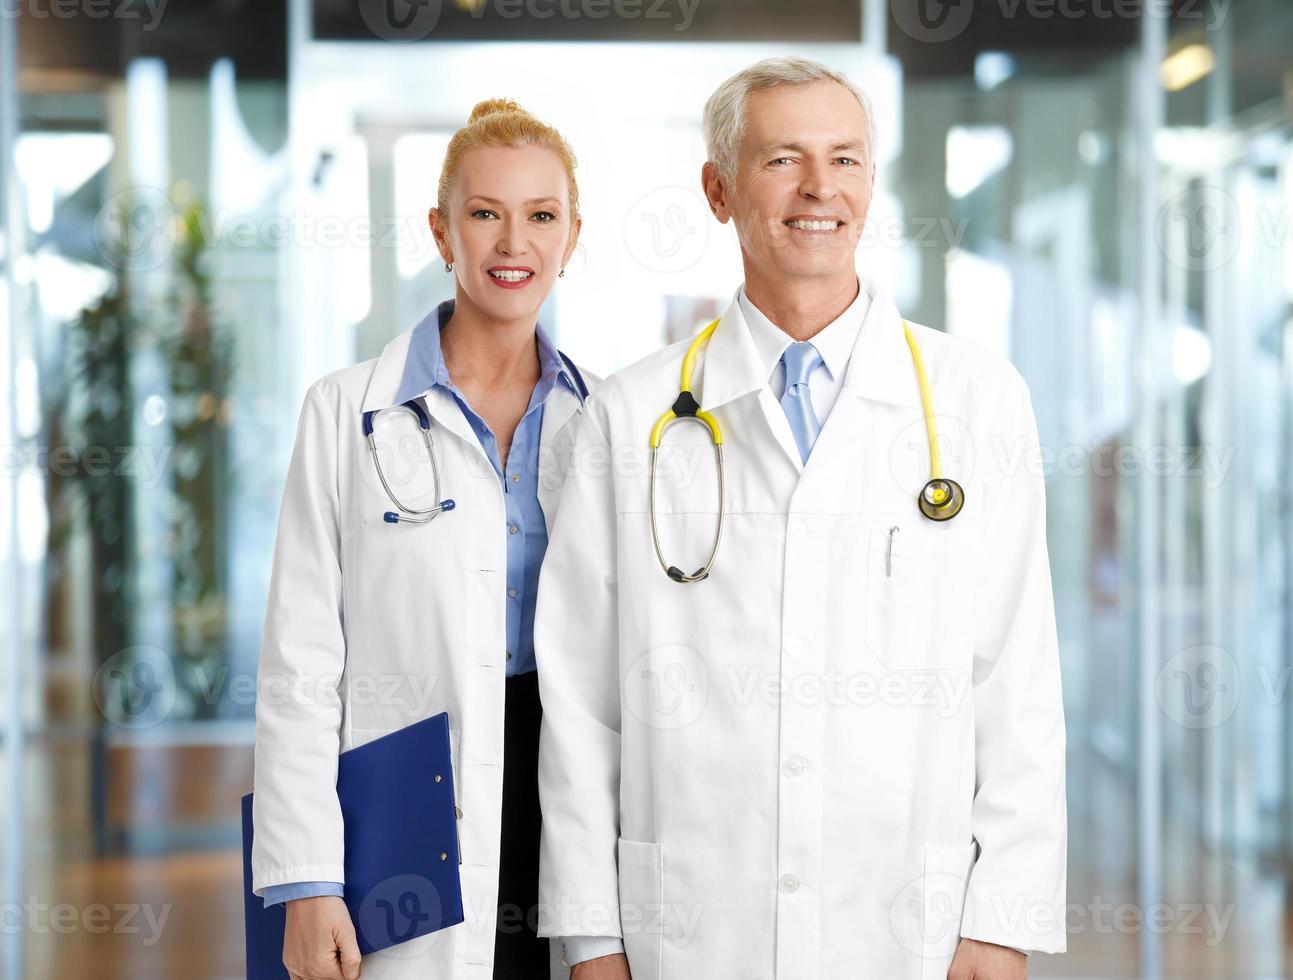 Doctors at hospital photo